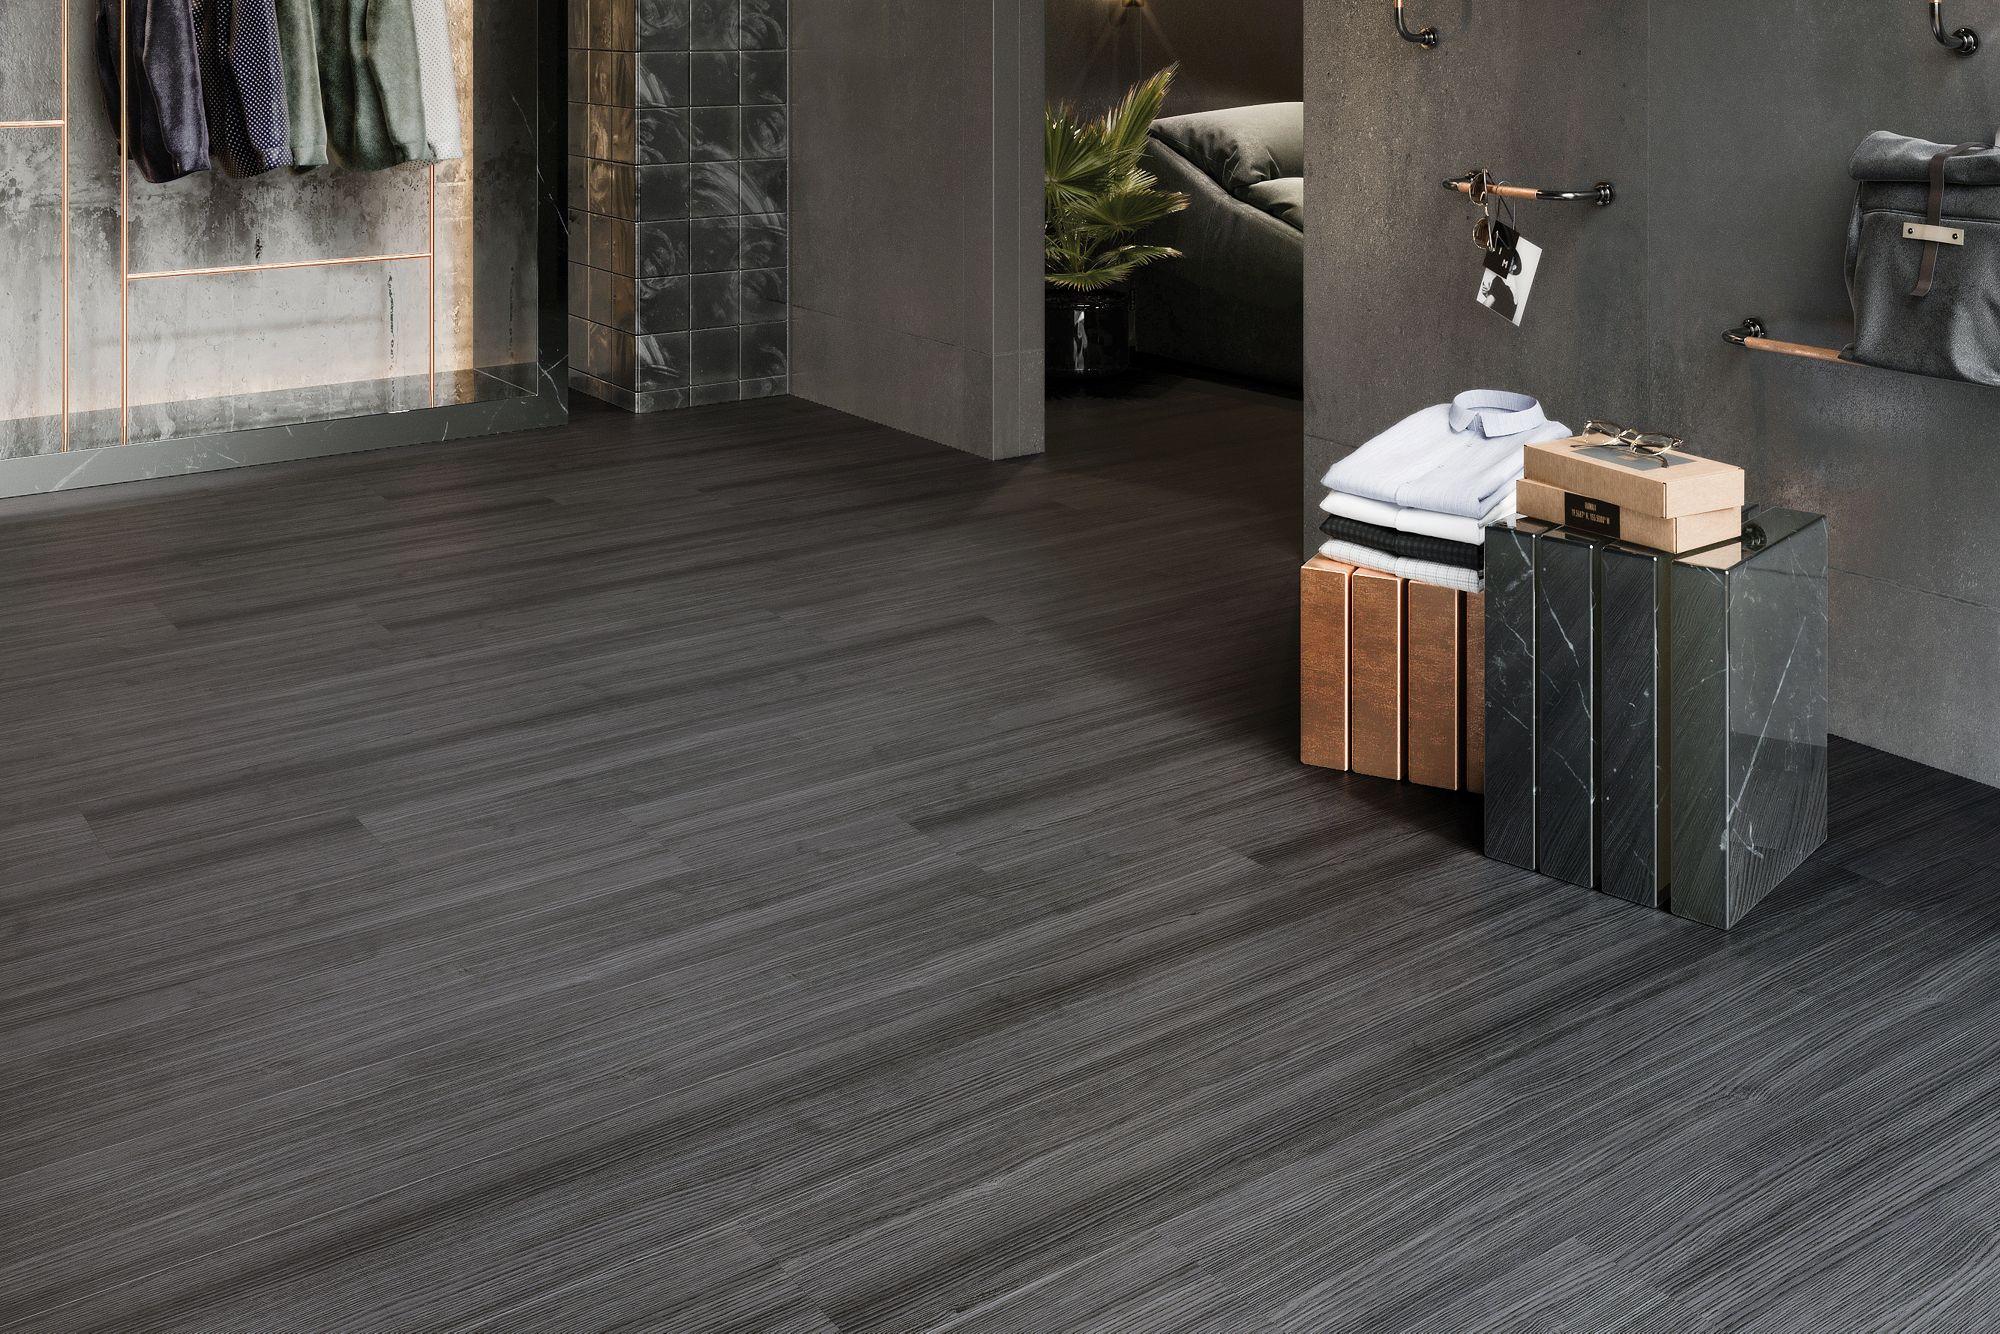 Luxury Vinyl Flooring Secoya, Mohawk Commercial Laminate Flooring